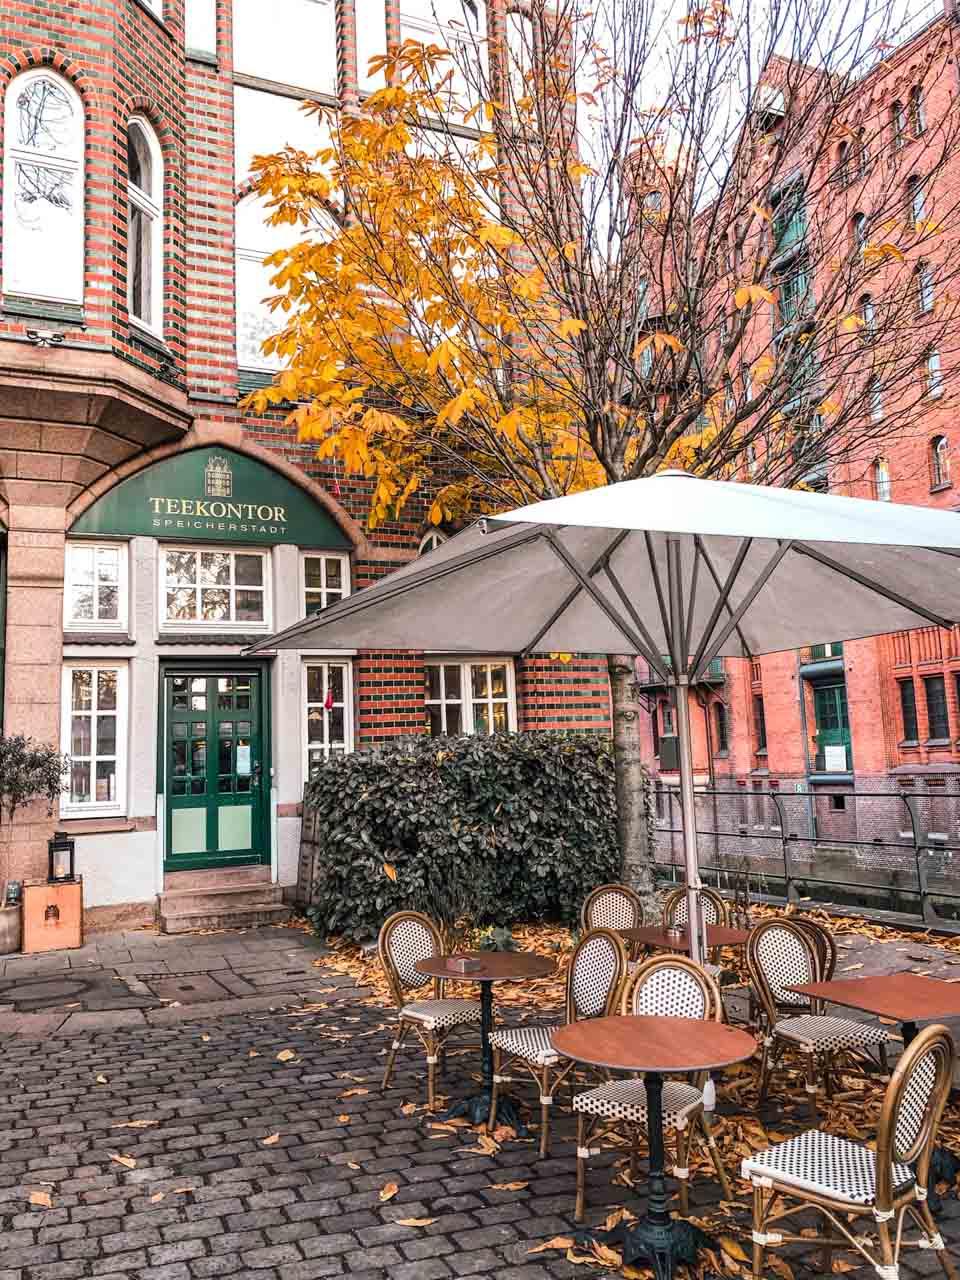 The outside of Wasserschloss Tea Shop in Hamburg